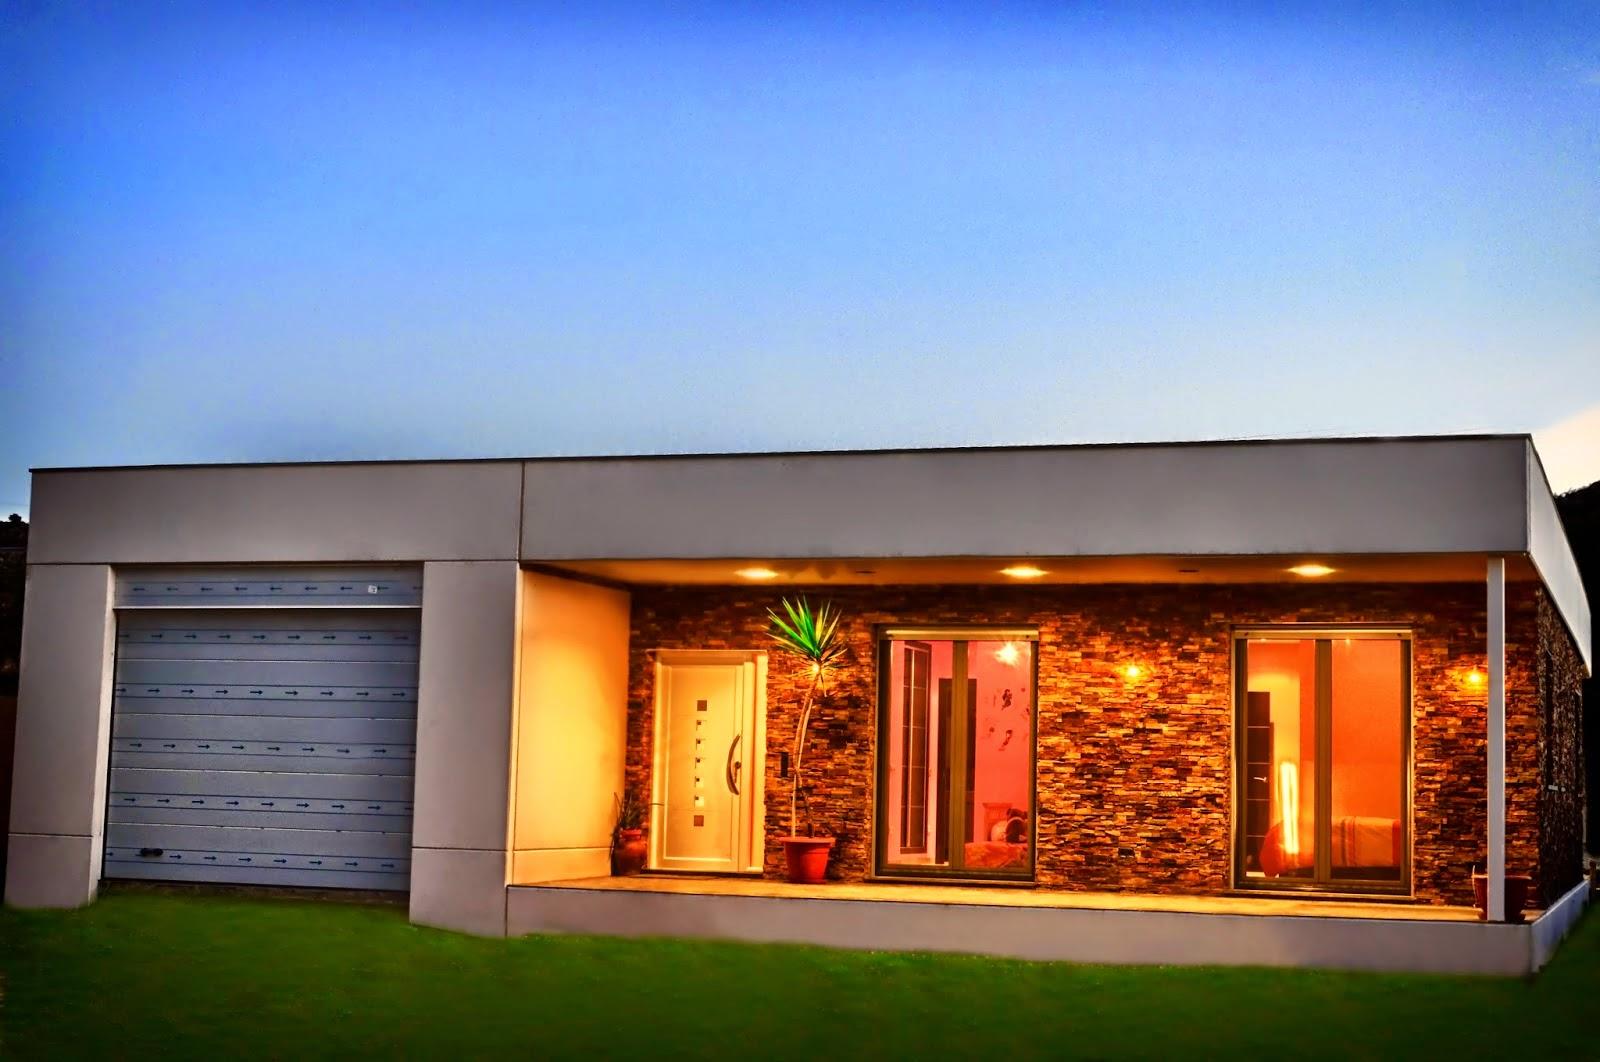 Uruguay 2030 arquitectura modular - Planos de casas prefabricadas economicas ...